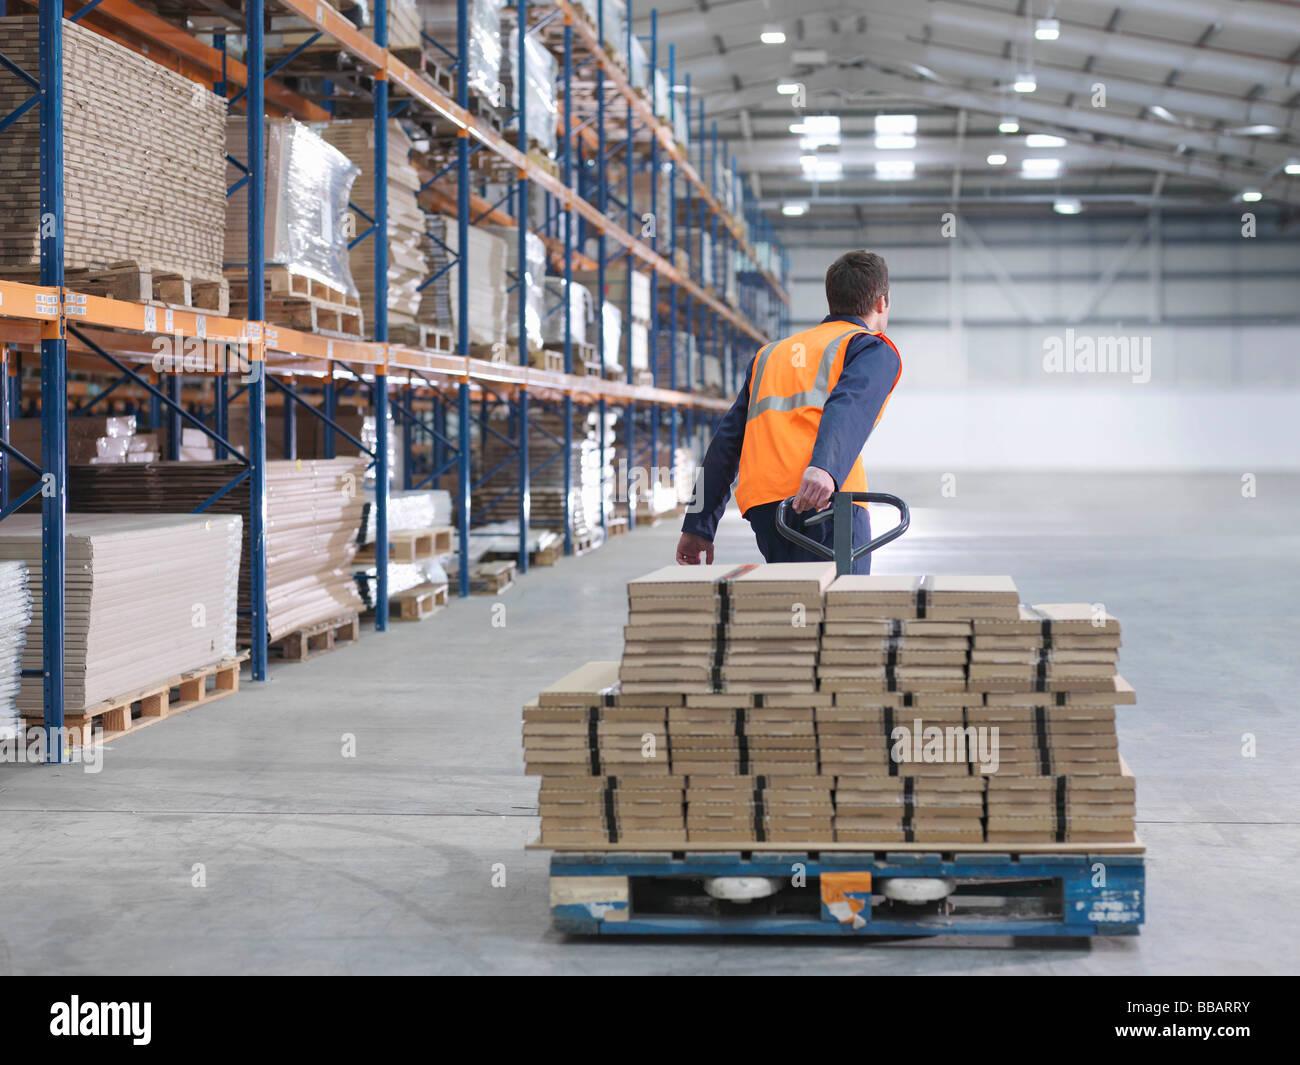 Trabajador de transportar carga en almacén Imagen De Stock